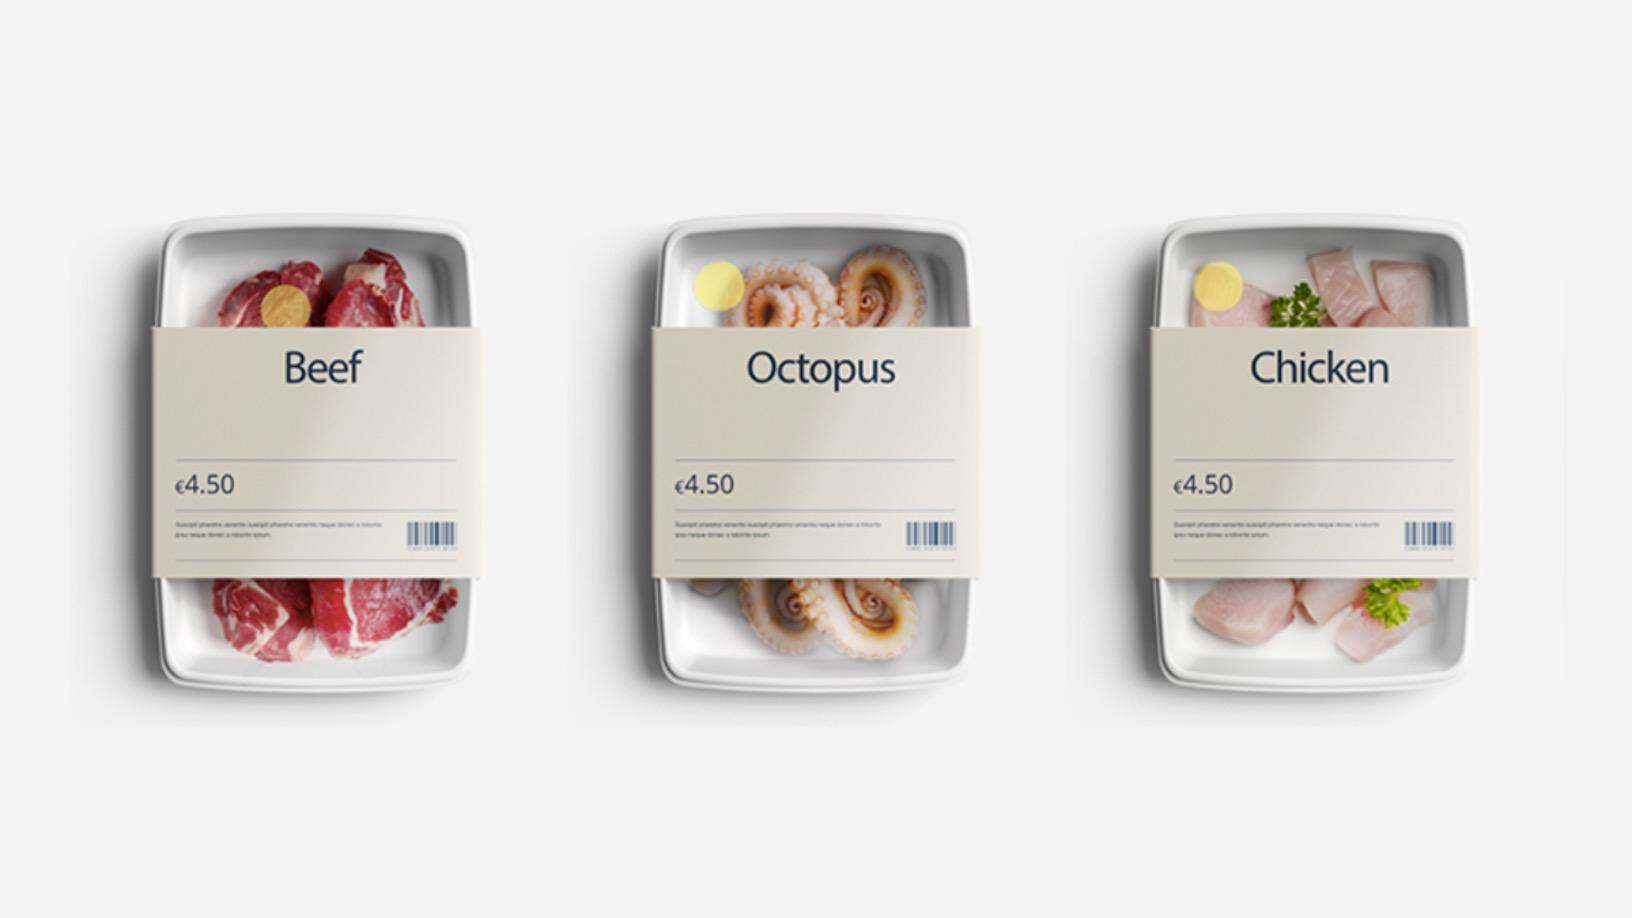 Oscillum: The intelligent label to reduce food waste